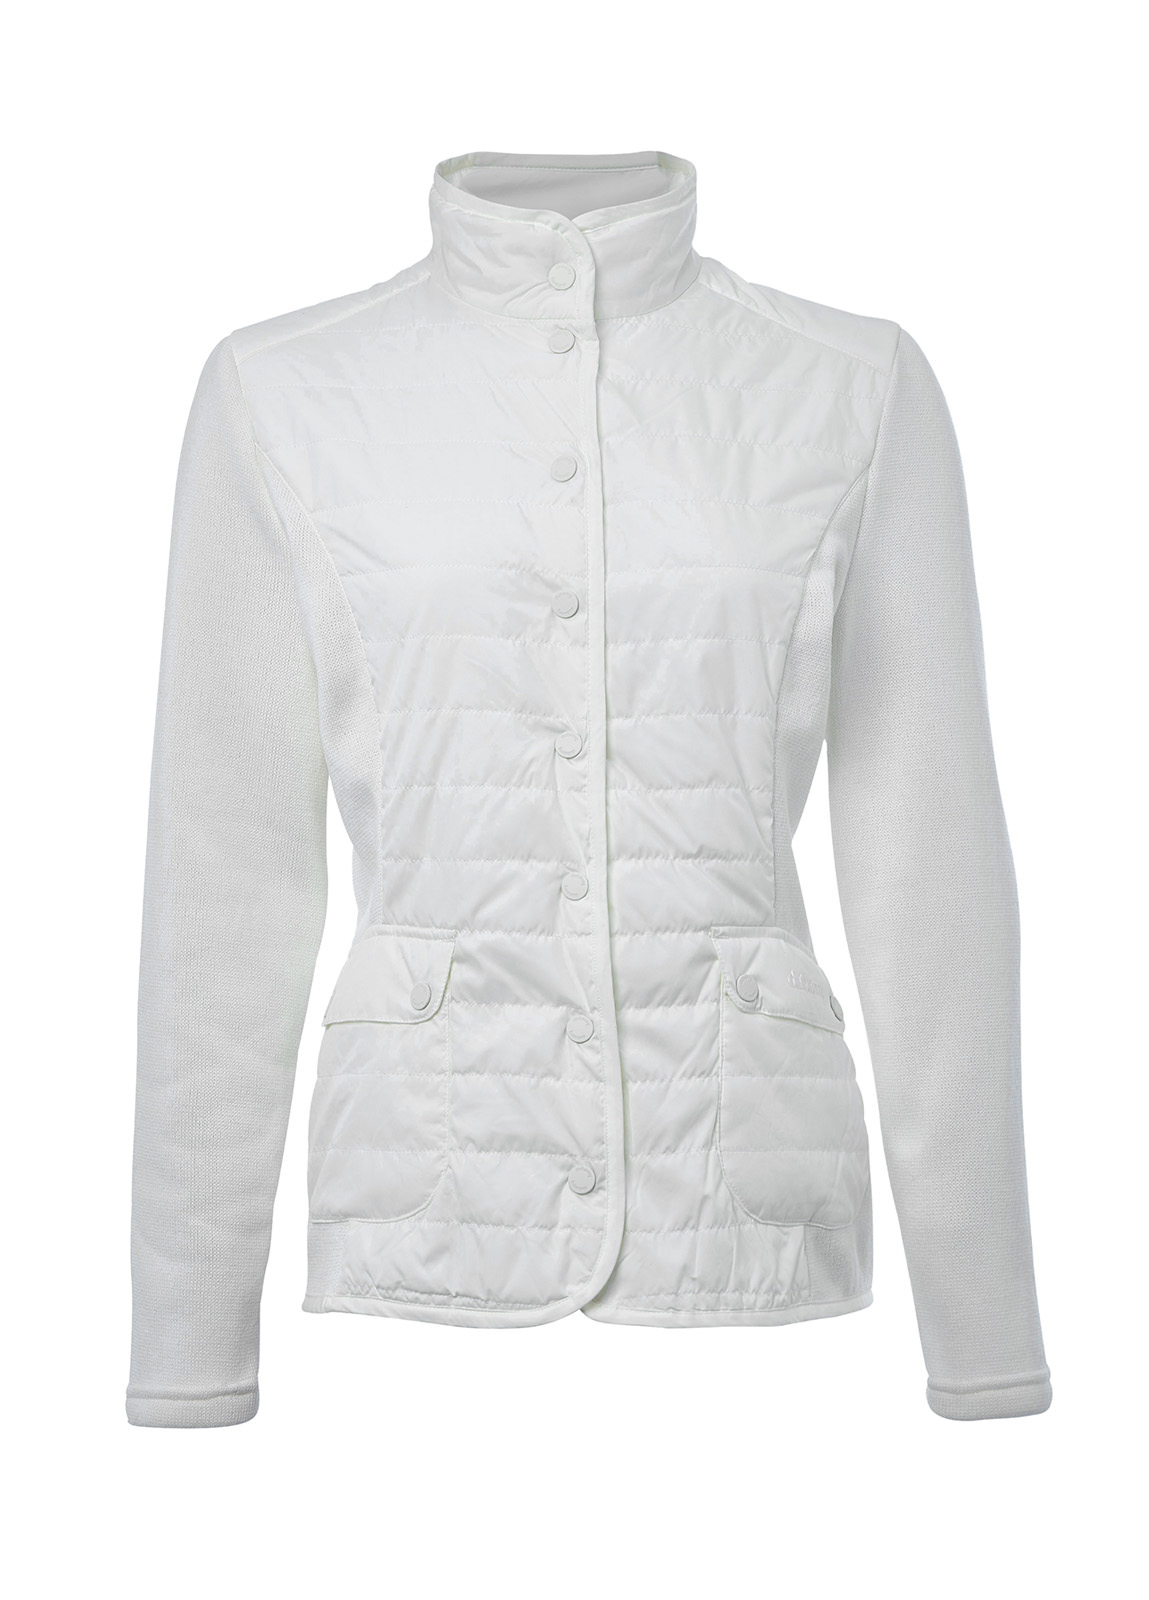 Dubarry_ Terryglass jacket - Sail White_Image_2